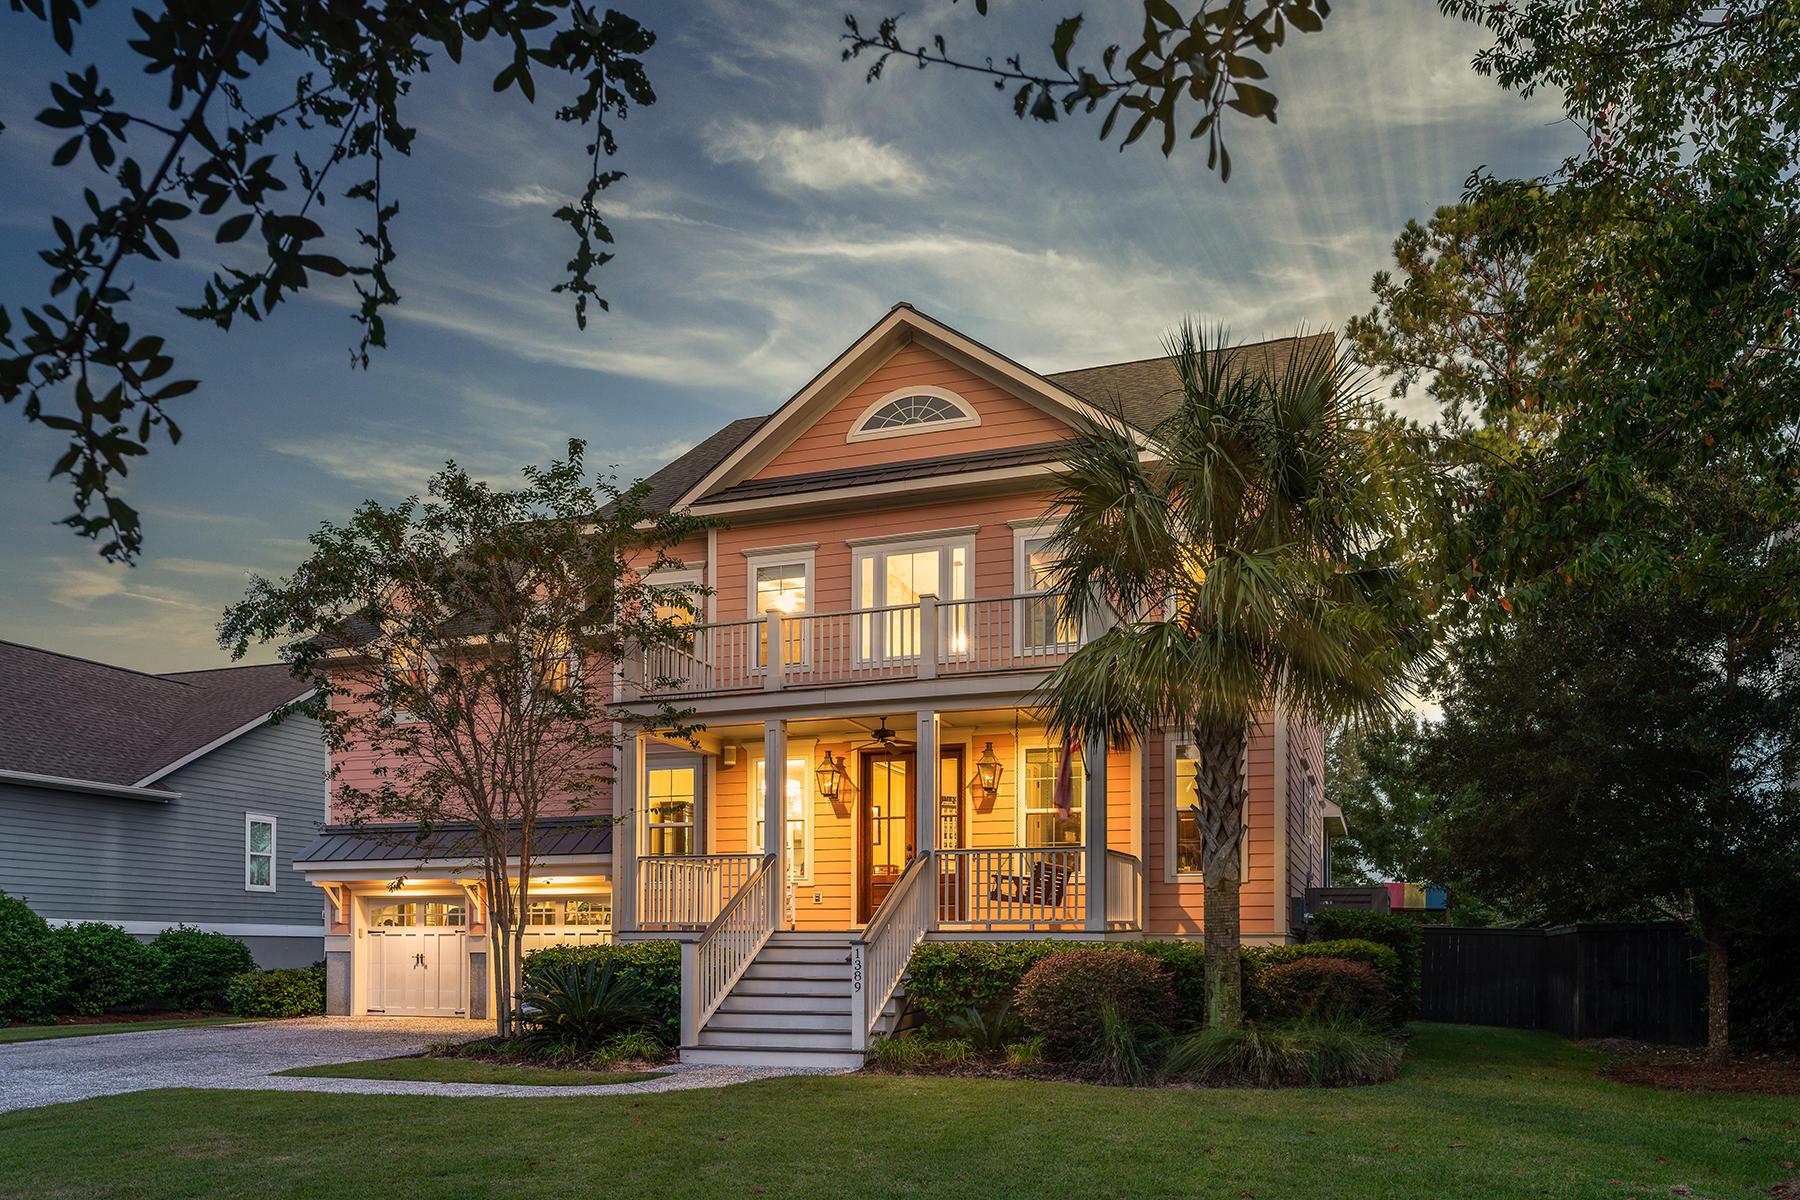 Scotts Creek Homes For Sale - 1389 Scotts Creek, Mount Pleasant, SC - 45